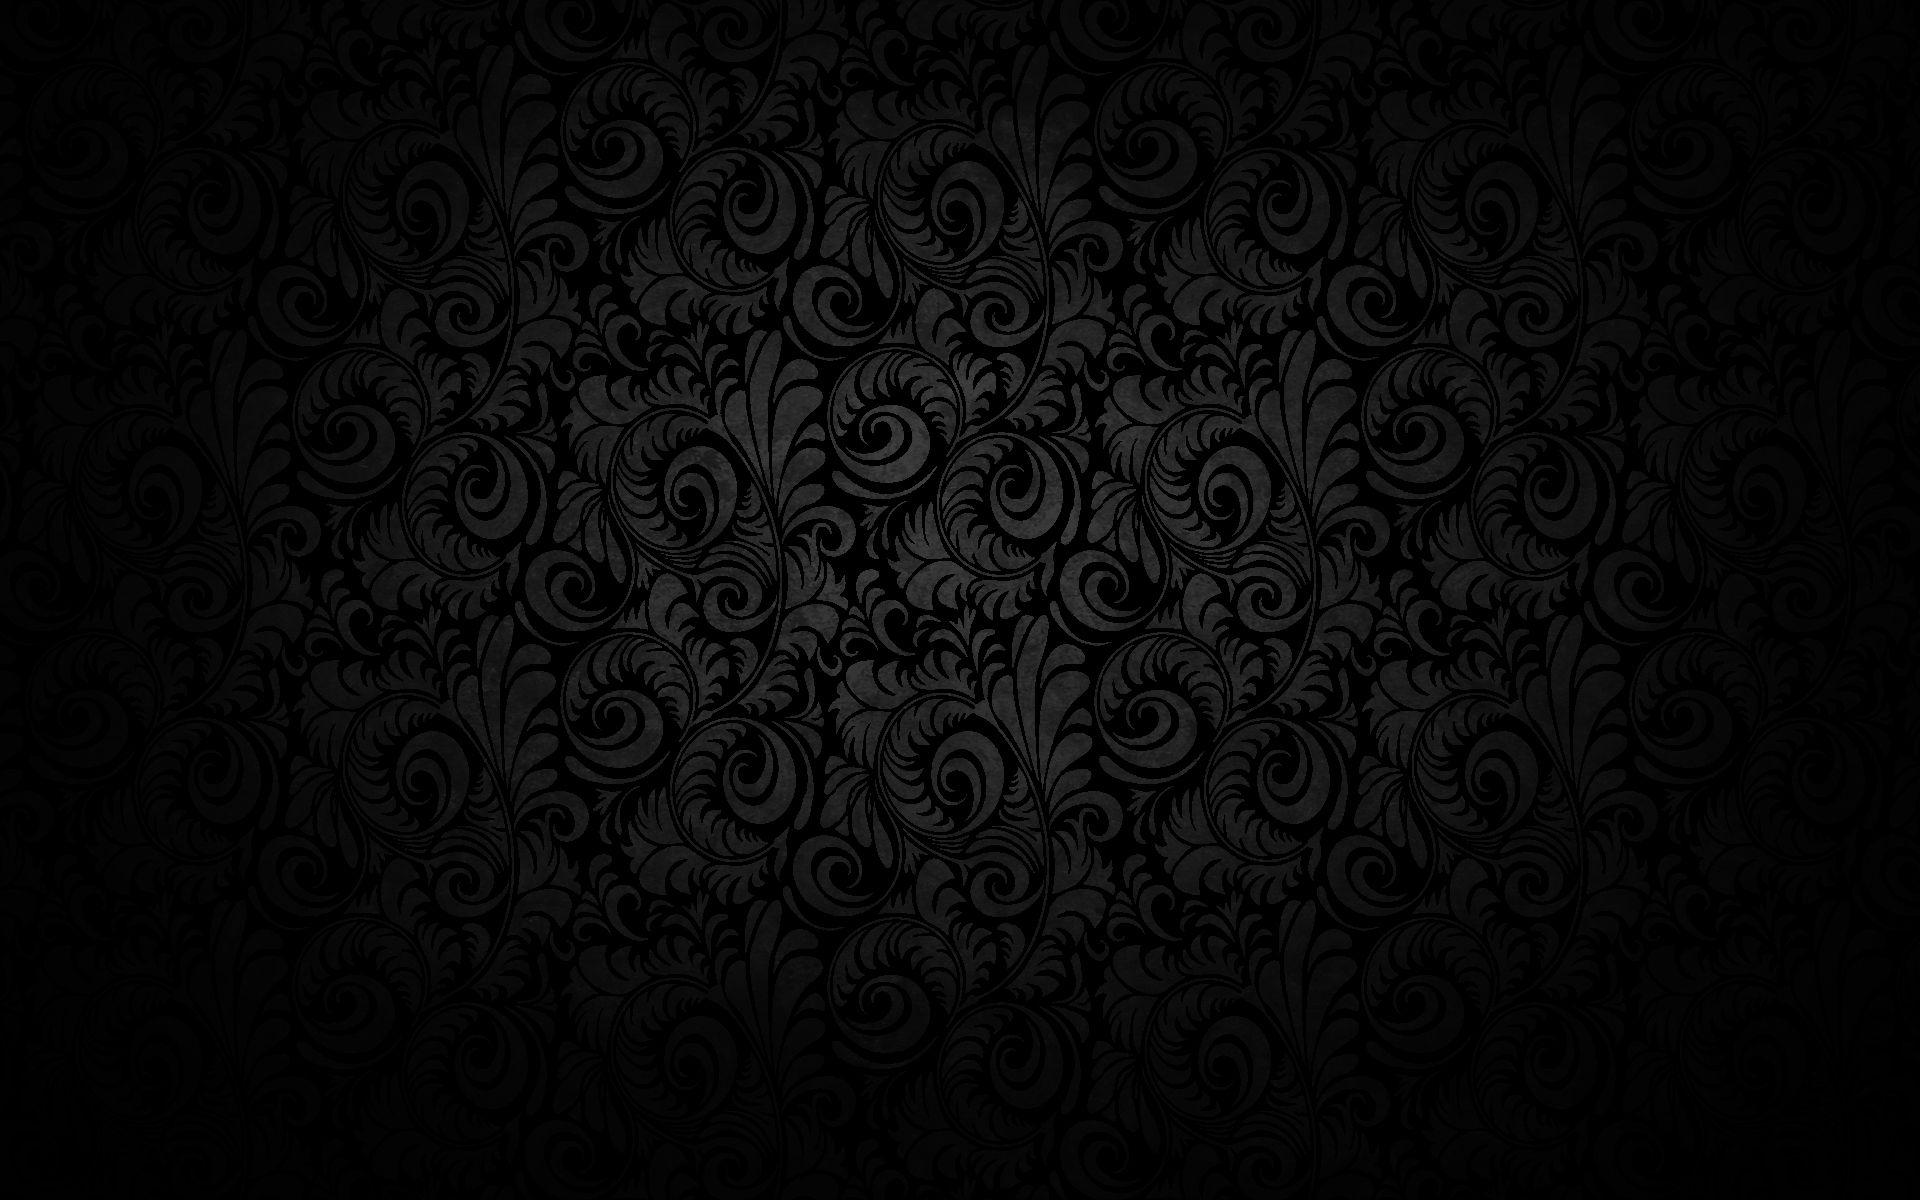 Textures Wallpapers Black Floral Texture Pattern Designbackground Wallpaper Black Hd Wallpaper Dark Black Wallpaper Gothic Wallpaper